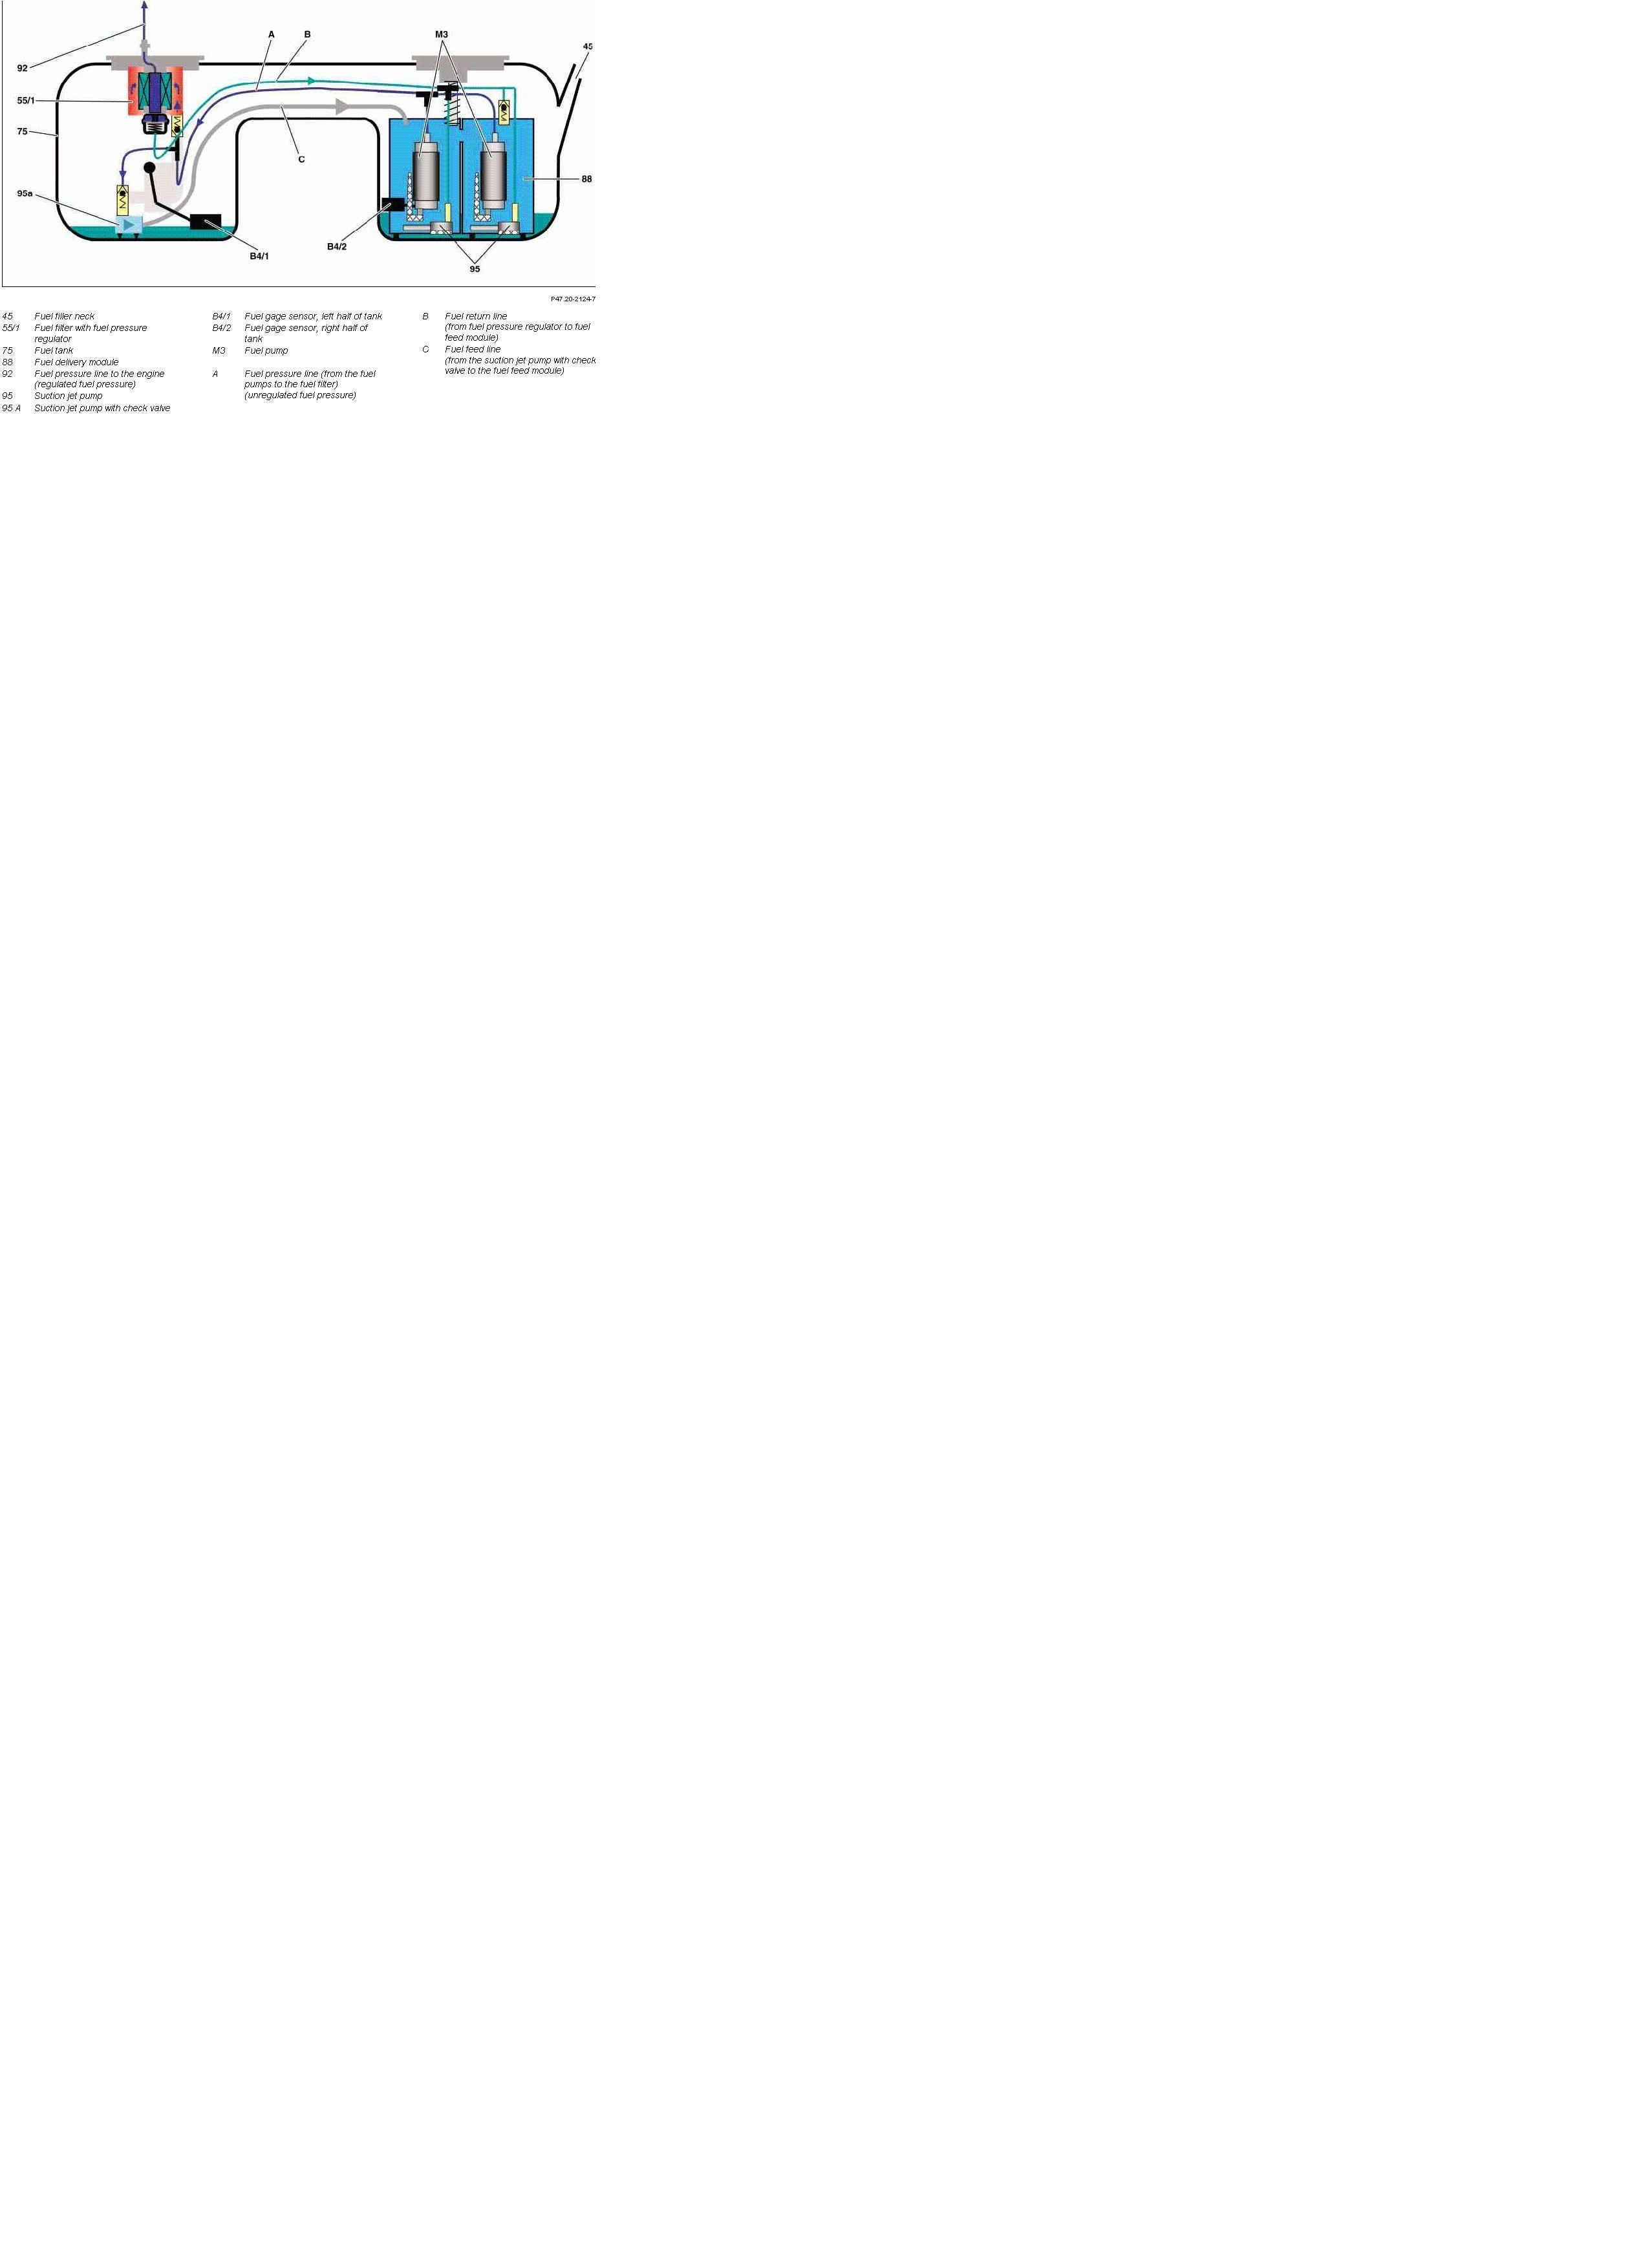 The Part A211 470 49 94 Fuel Filter Sending Unit For A Mercedes Clk320 Graphic